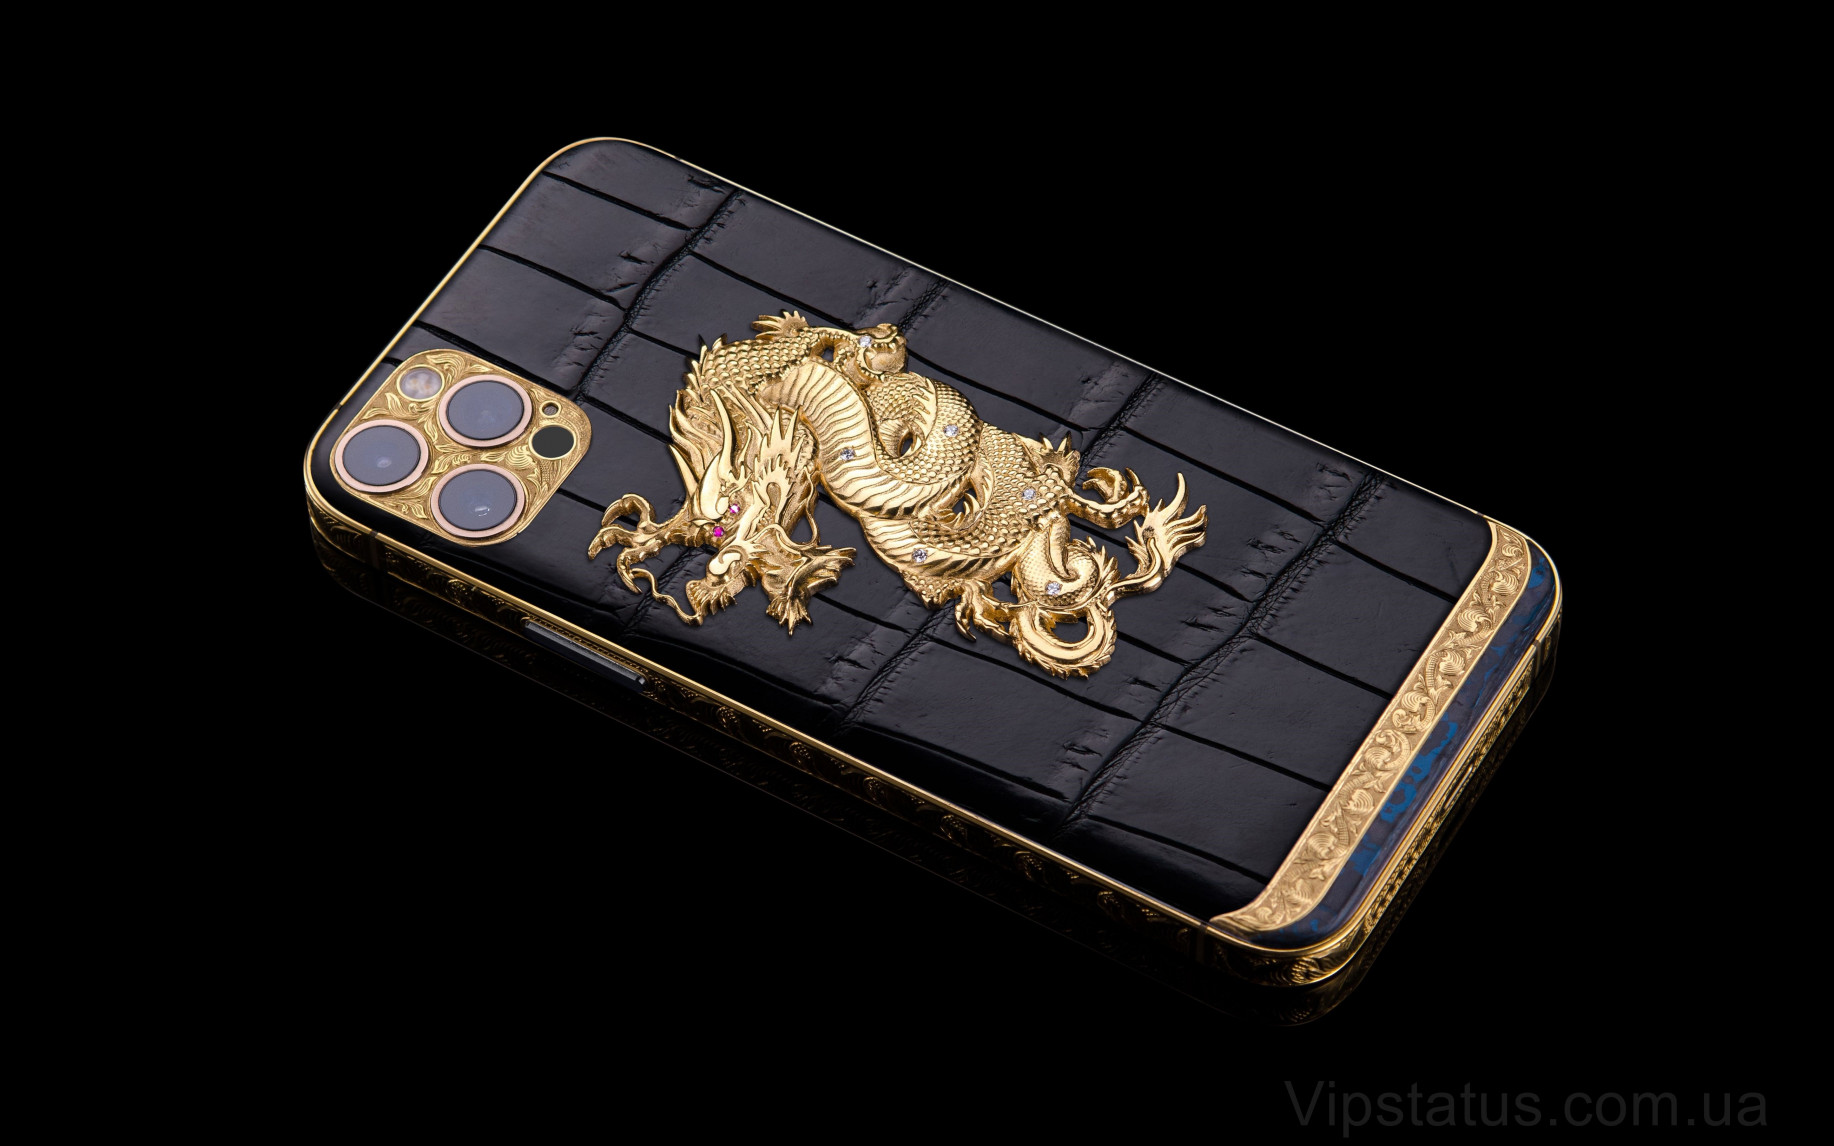 Elite Oriental Dragon IPHONE 12 PRO MAX 512 GB Oriental Dragon IPHONE 12 PRO MAX 512 GB image 29